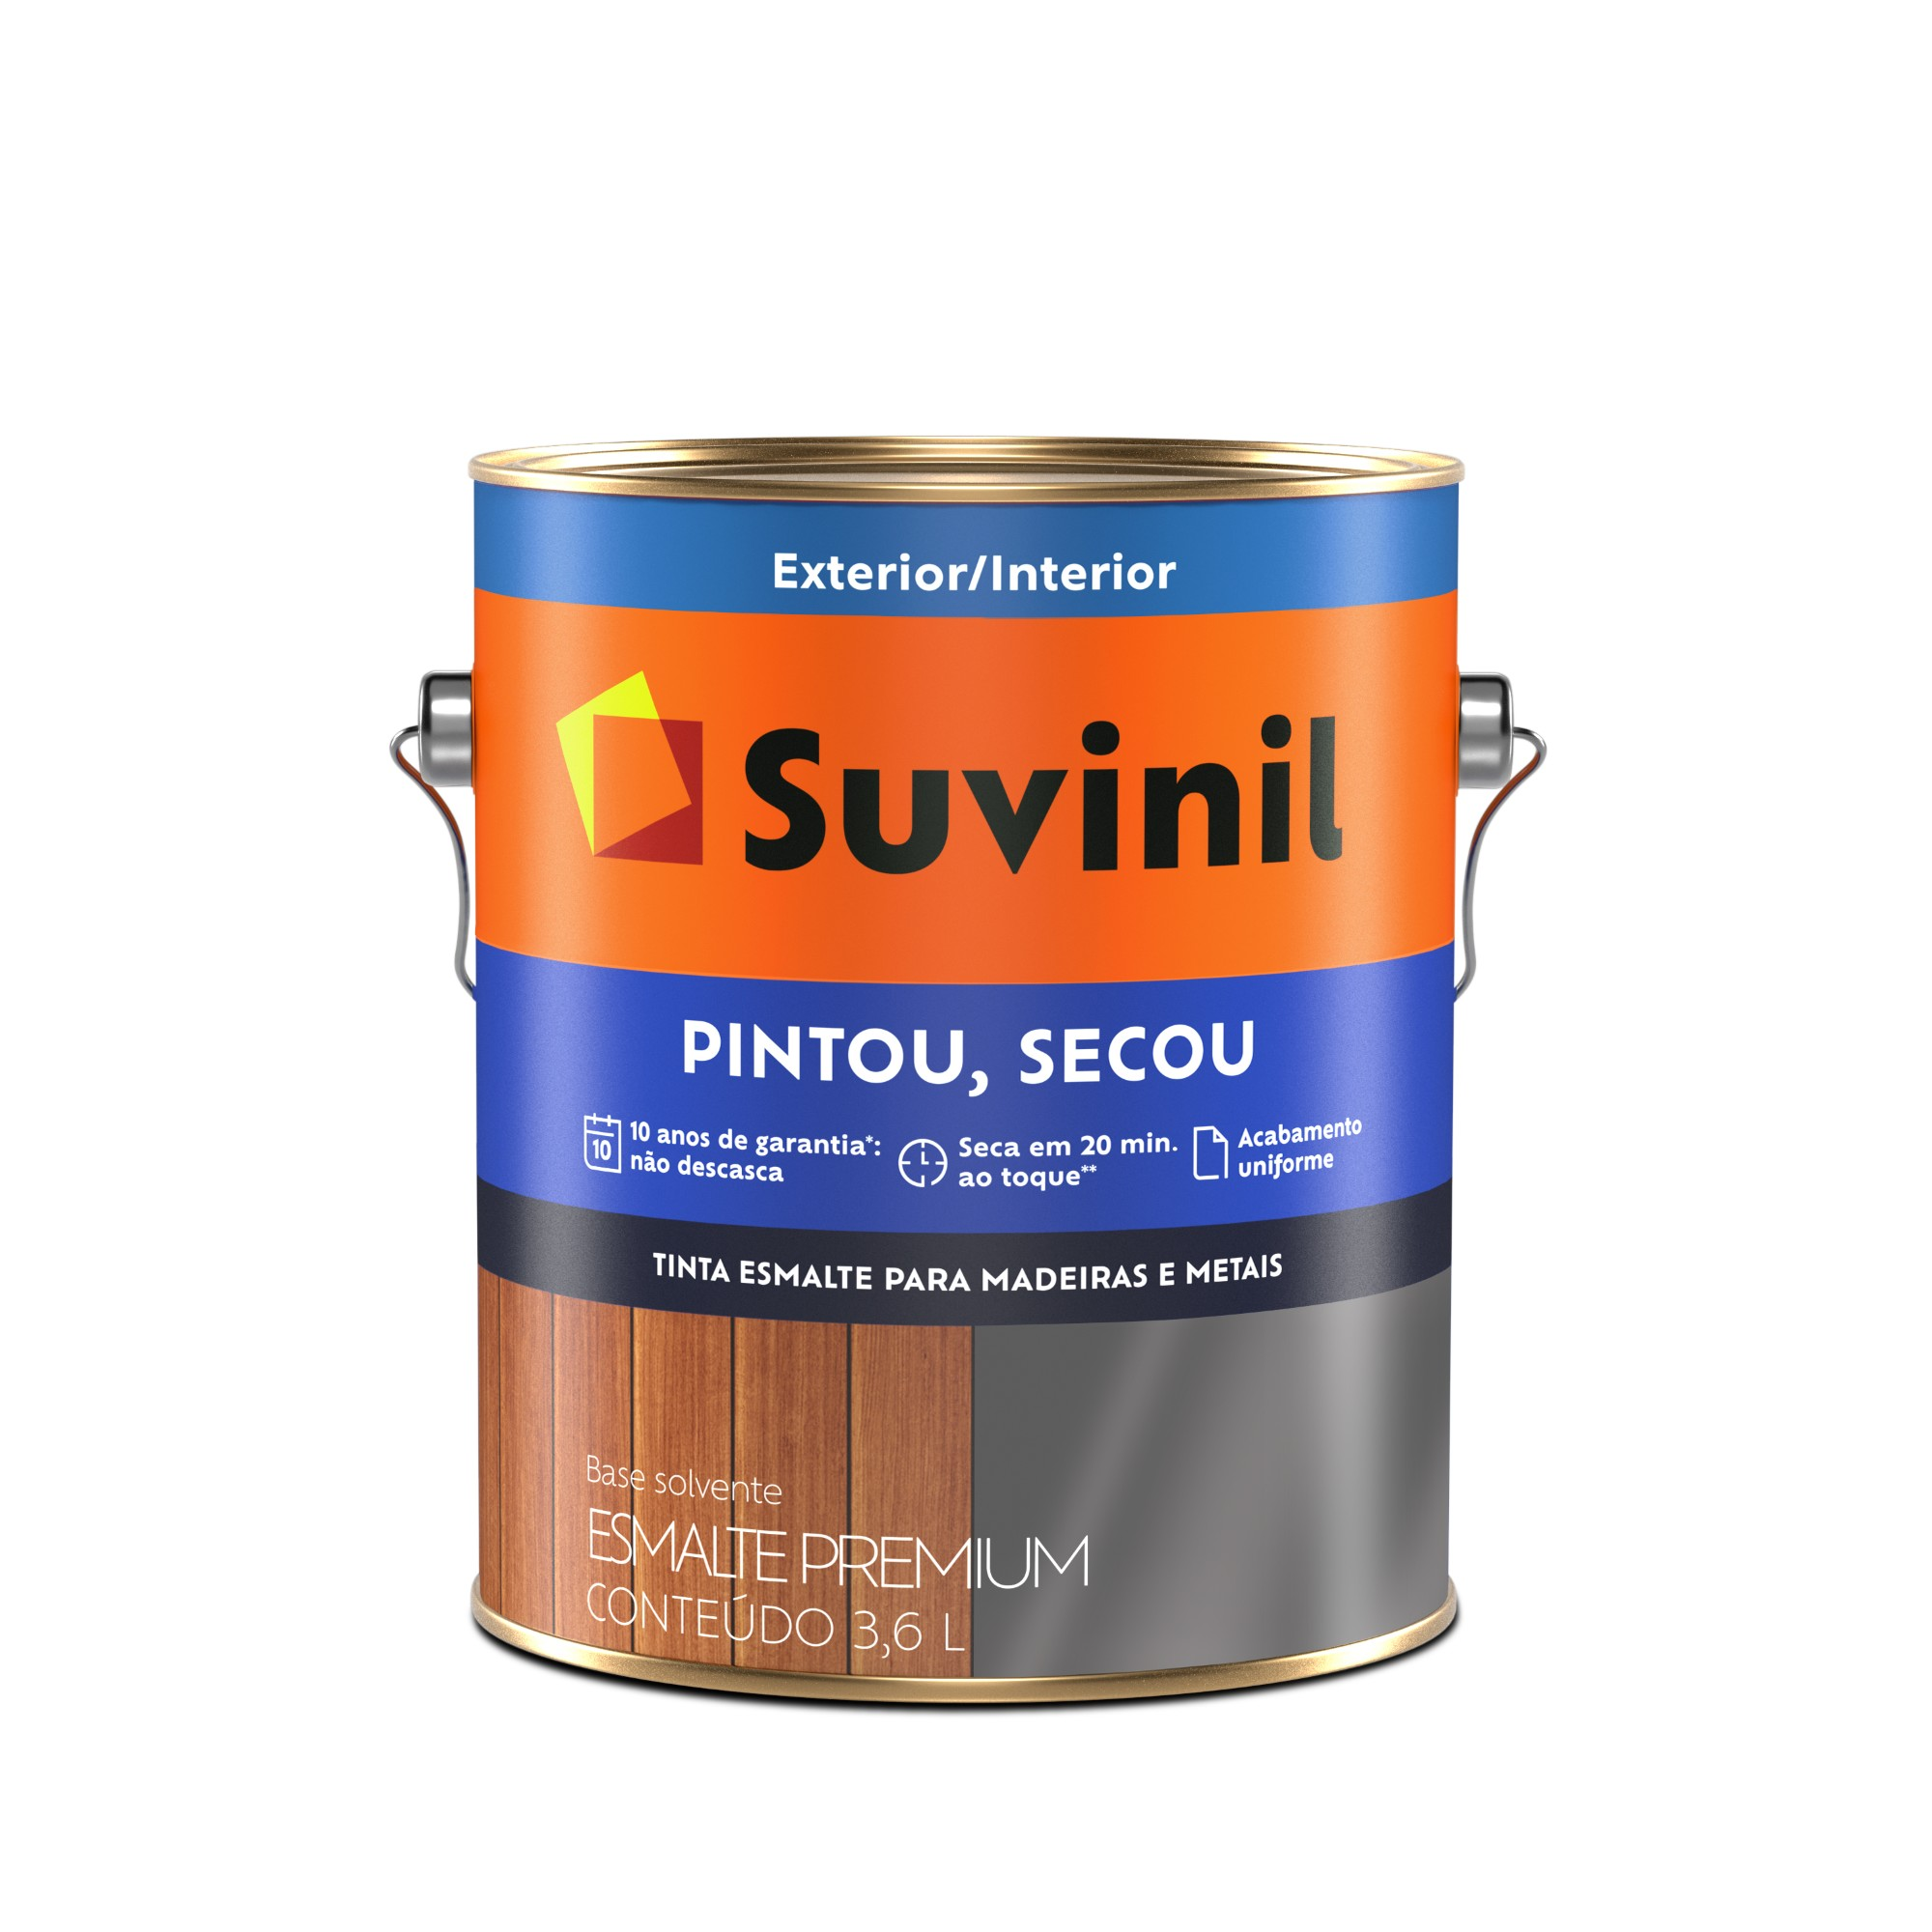 Tinta Esmalte Sintetico Brilhante Premium 36L - Branco Gelo - Pintou Secou Suvinil